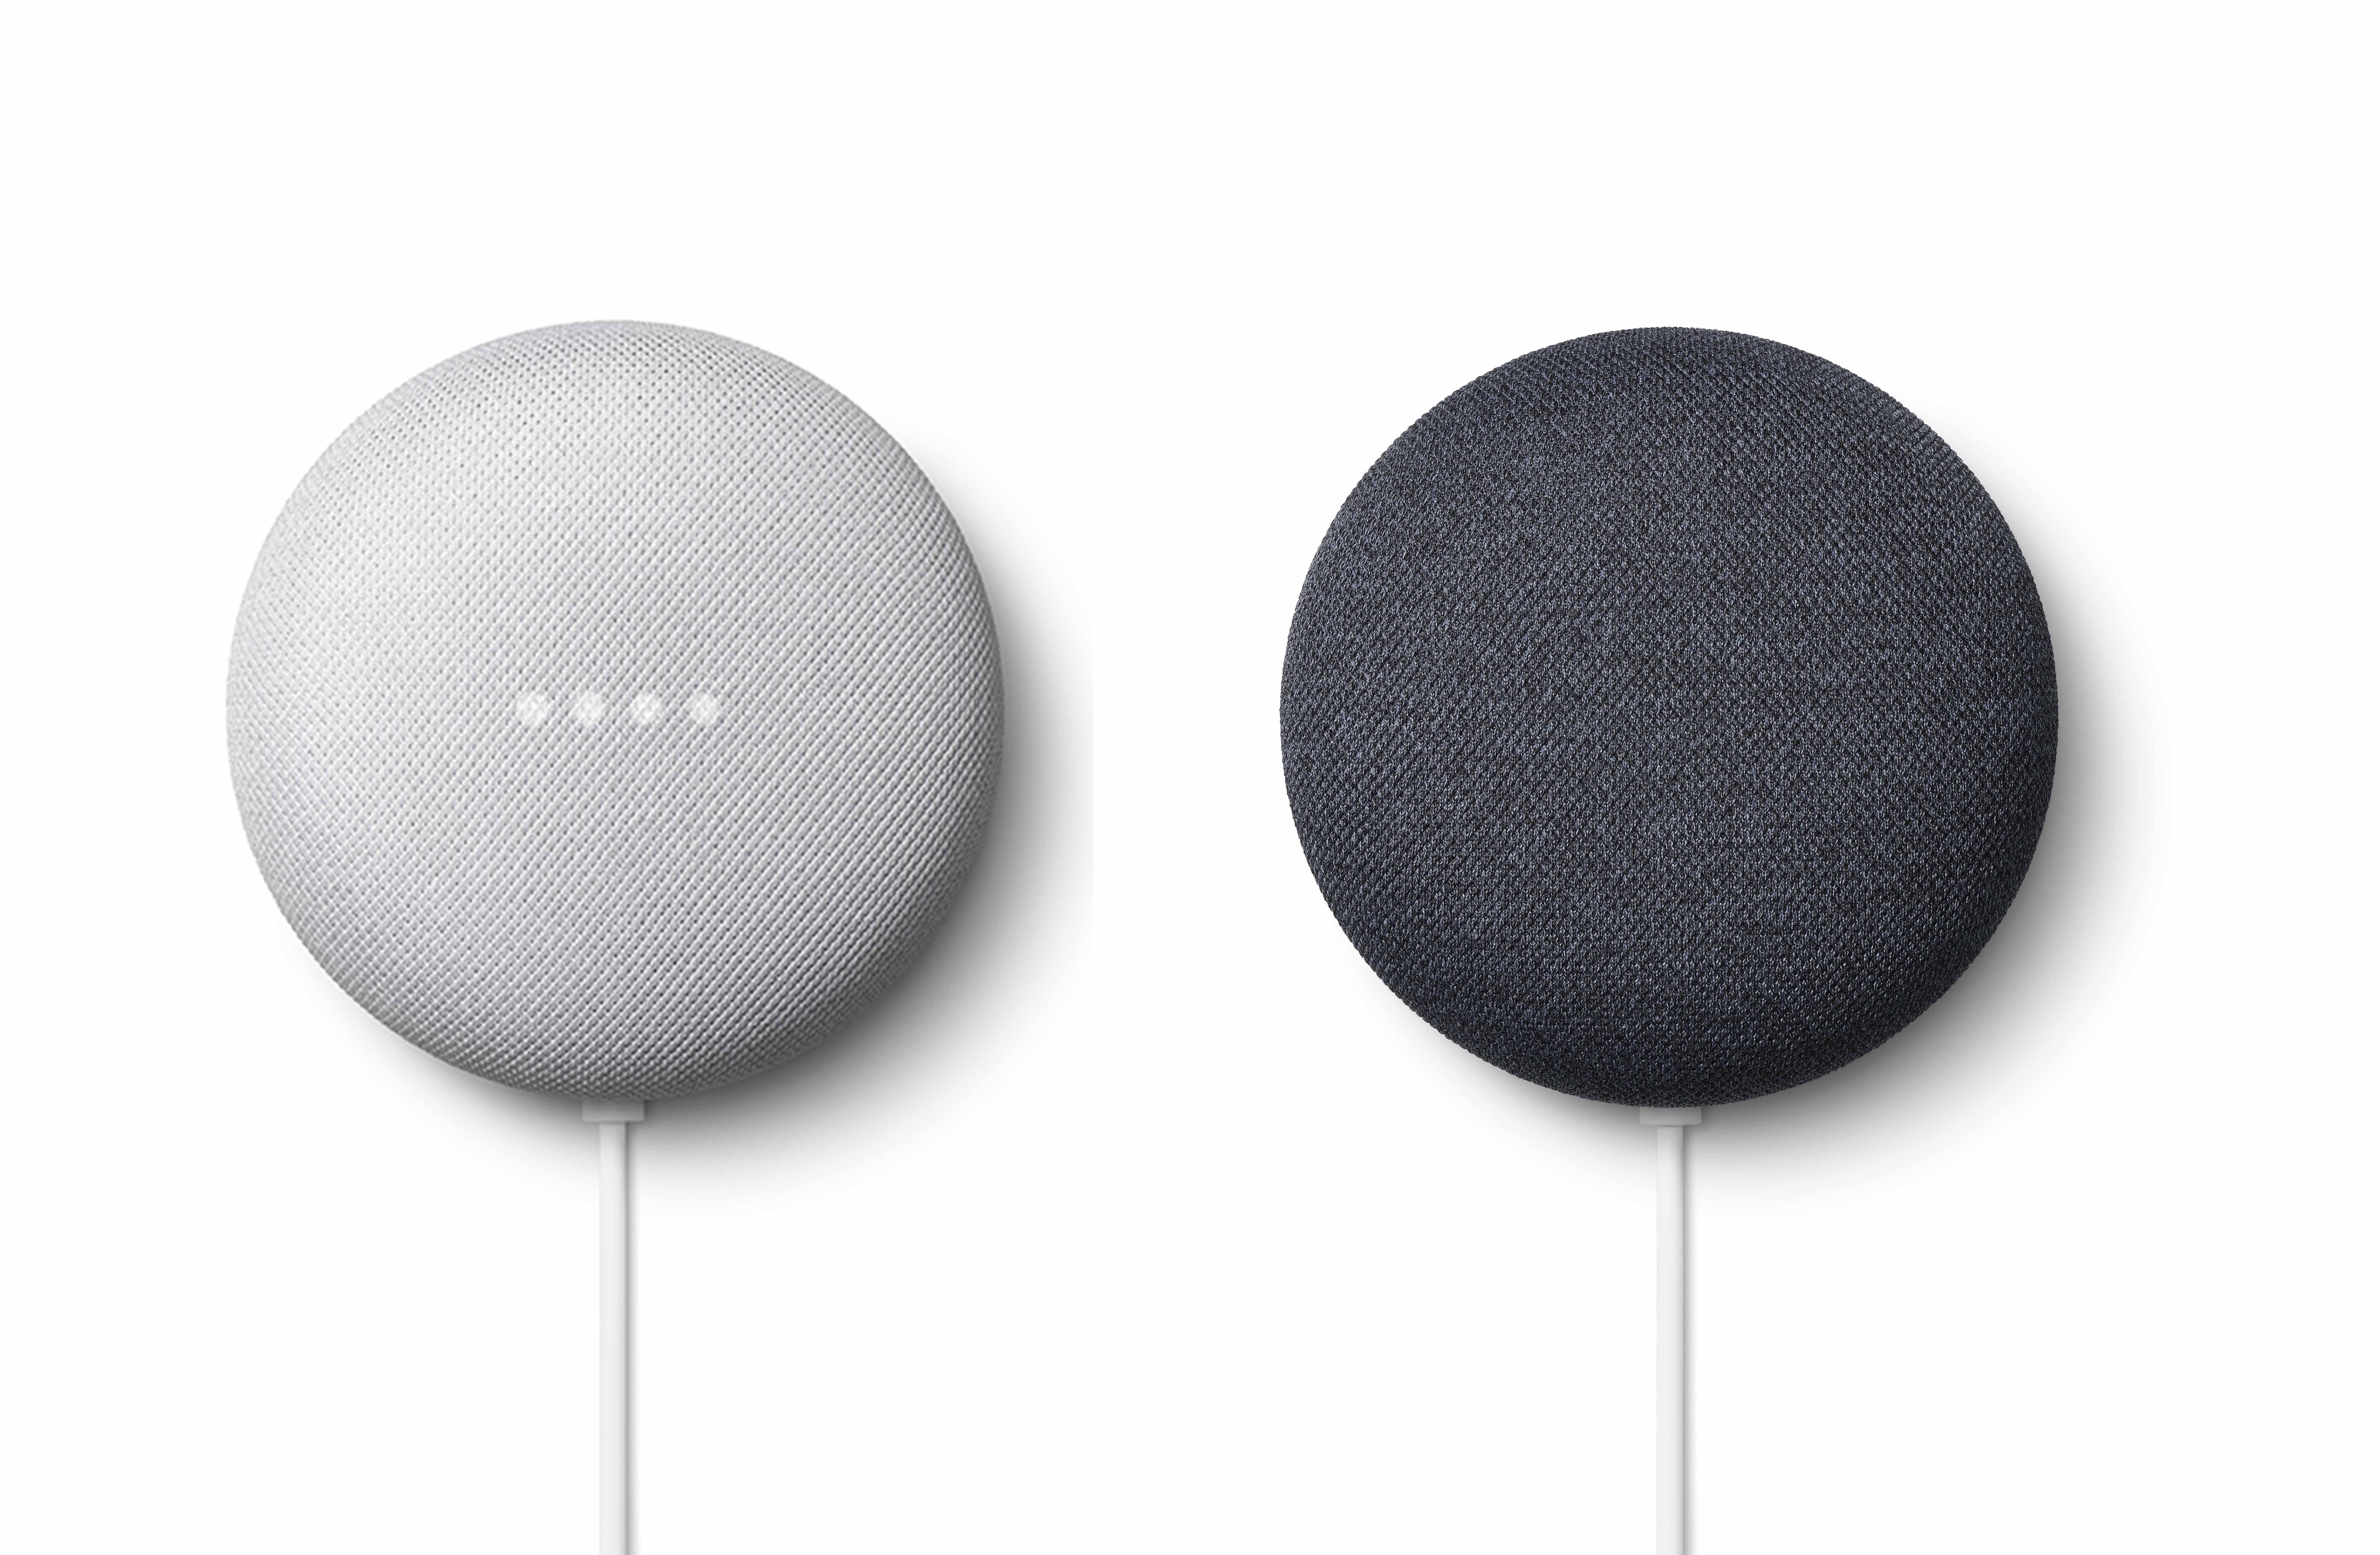 Nest Mini 讓用戶不動手就能啟動多項智慧家電、享受豐富的影音娛樂.jpg